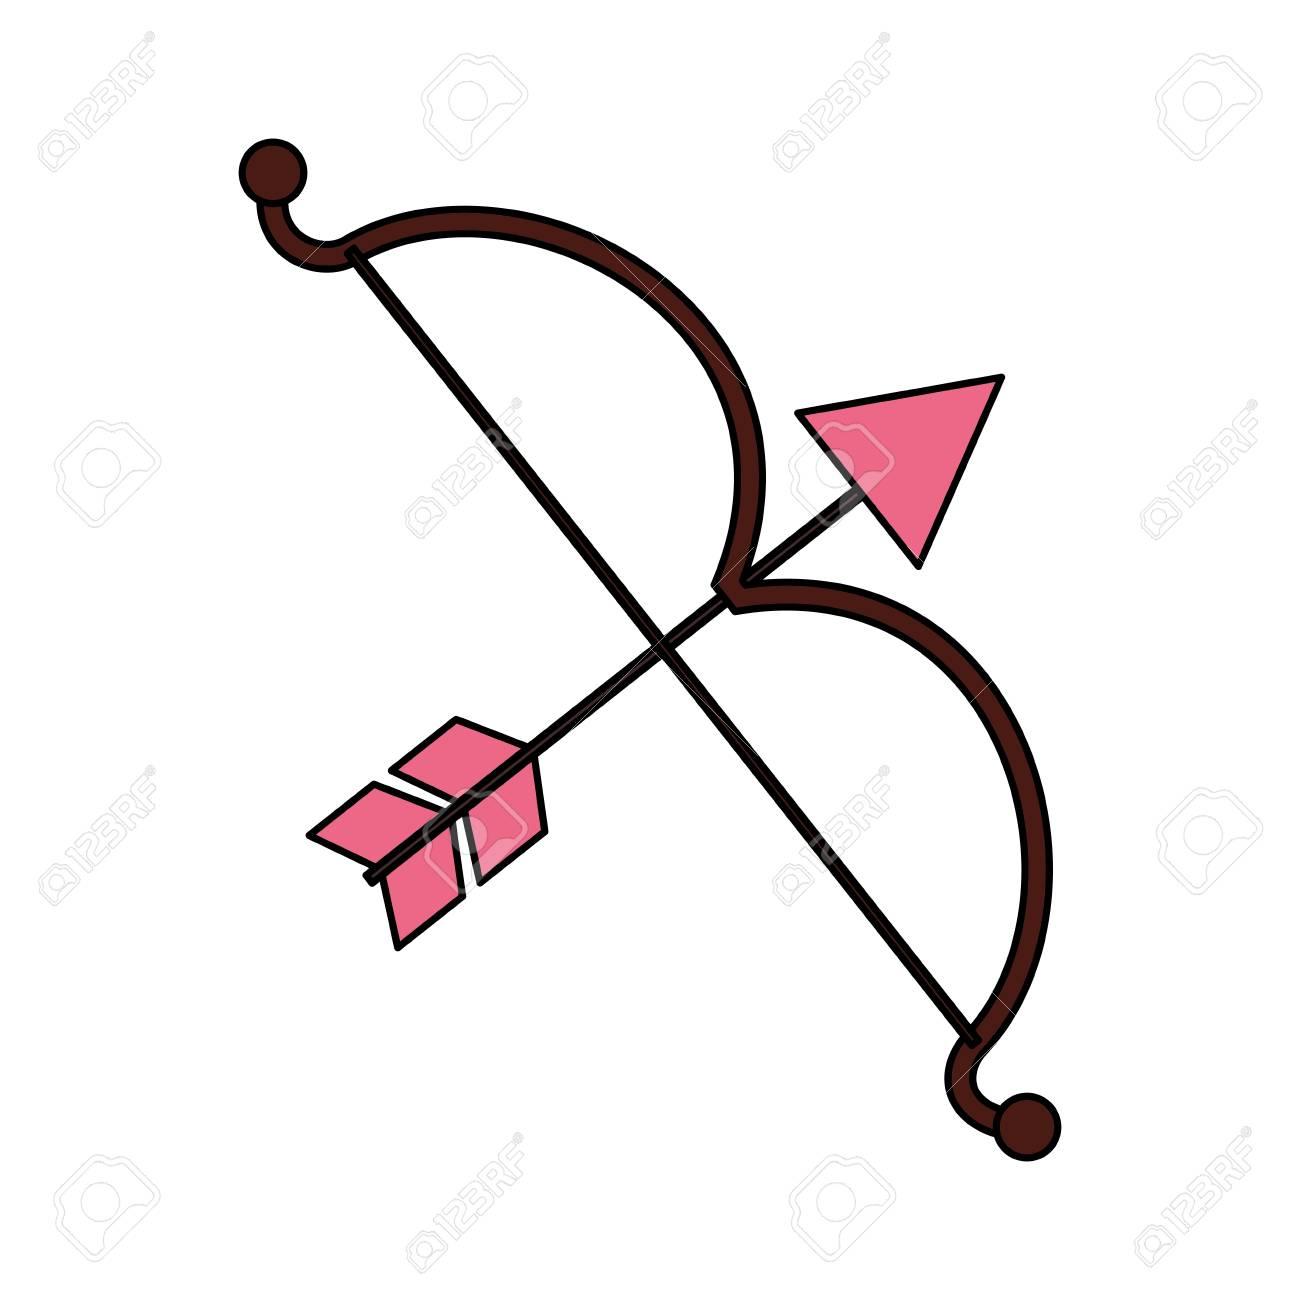 cupid bow arrow valentine day vector illustration.